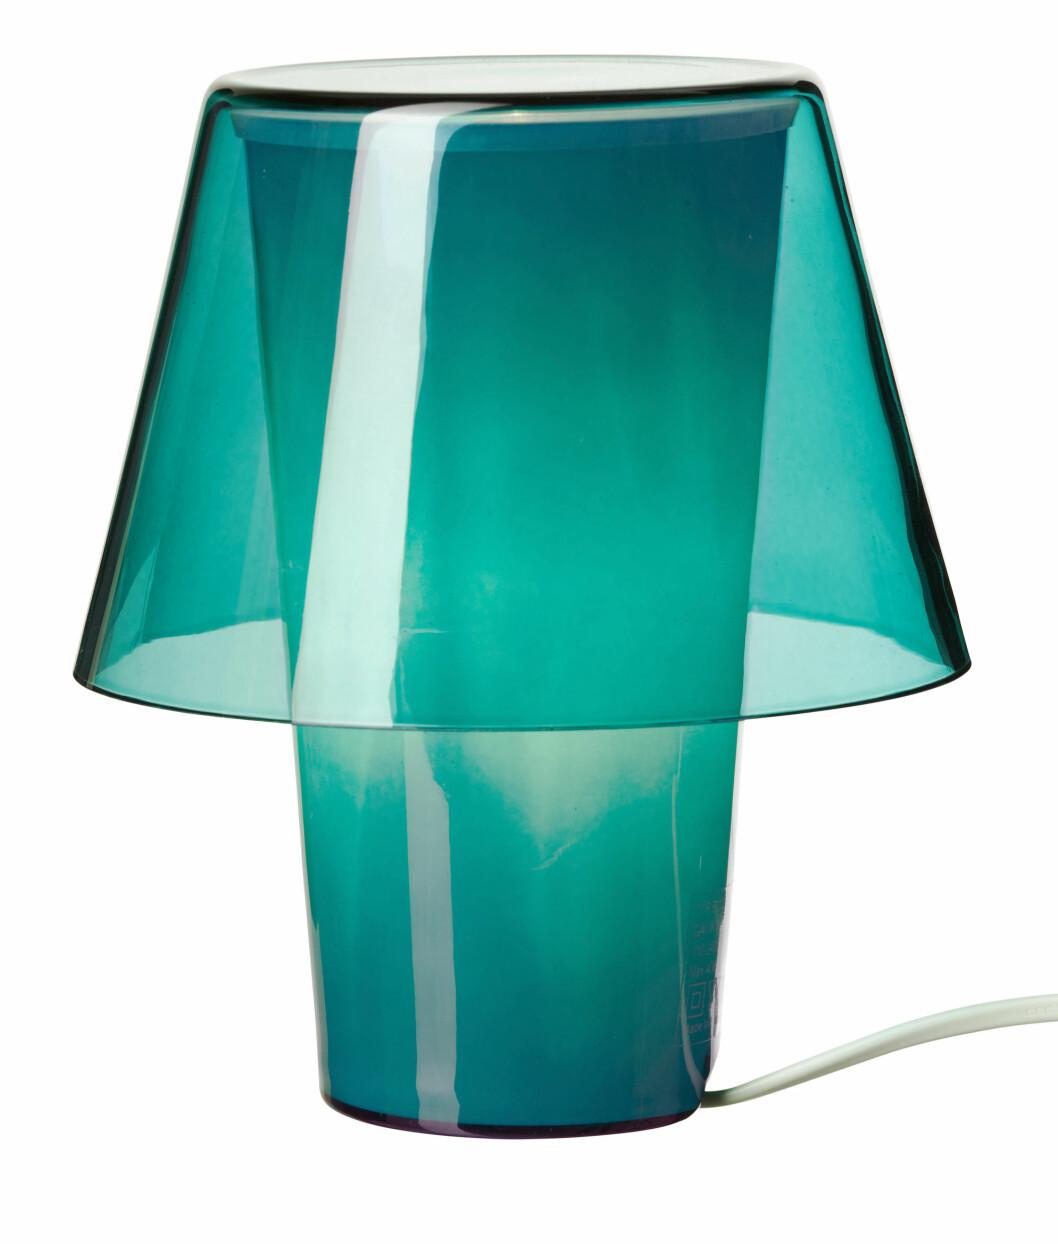 Bordlampe (kr 98). Foto: Produsenten